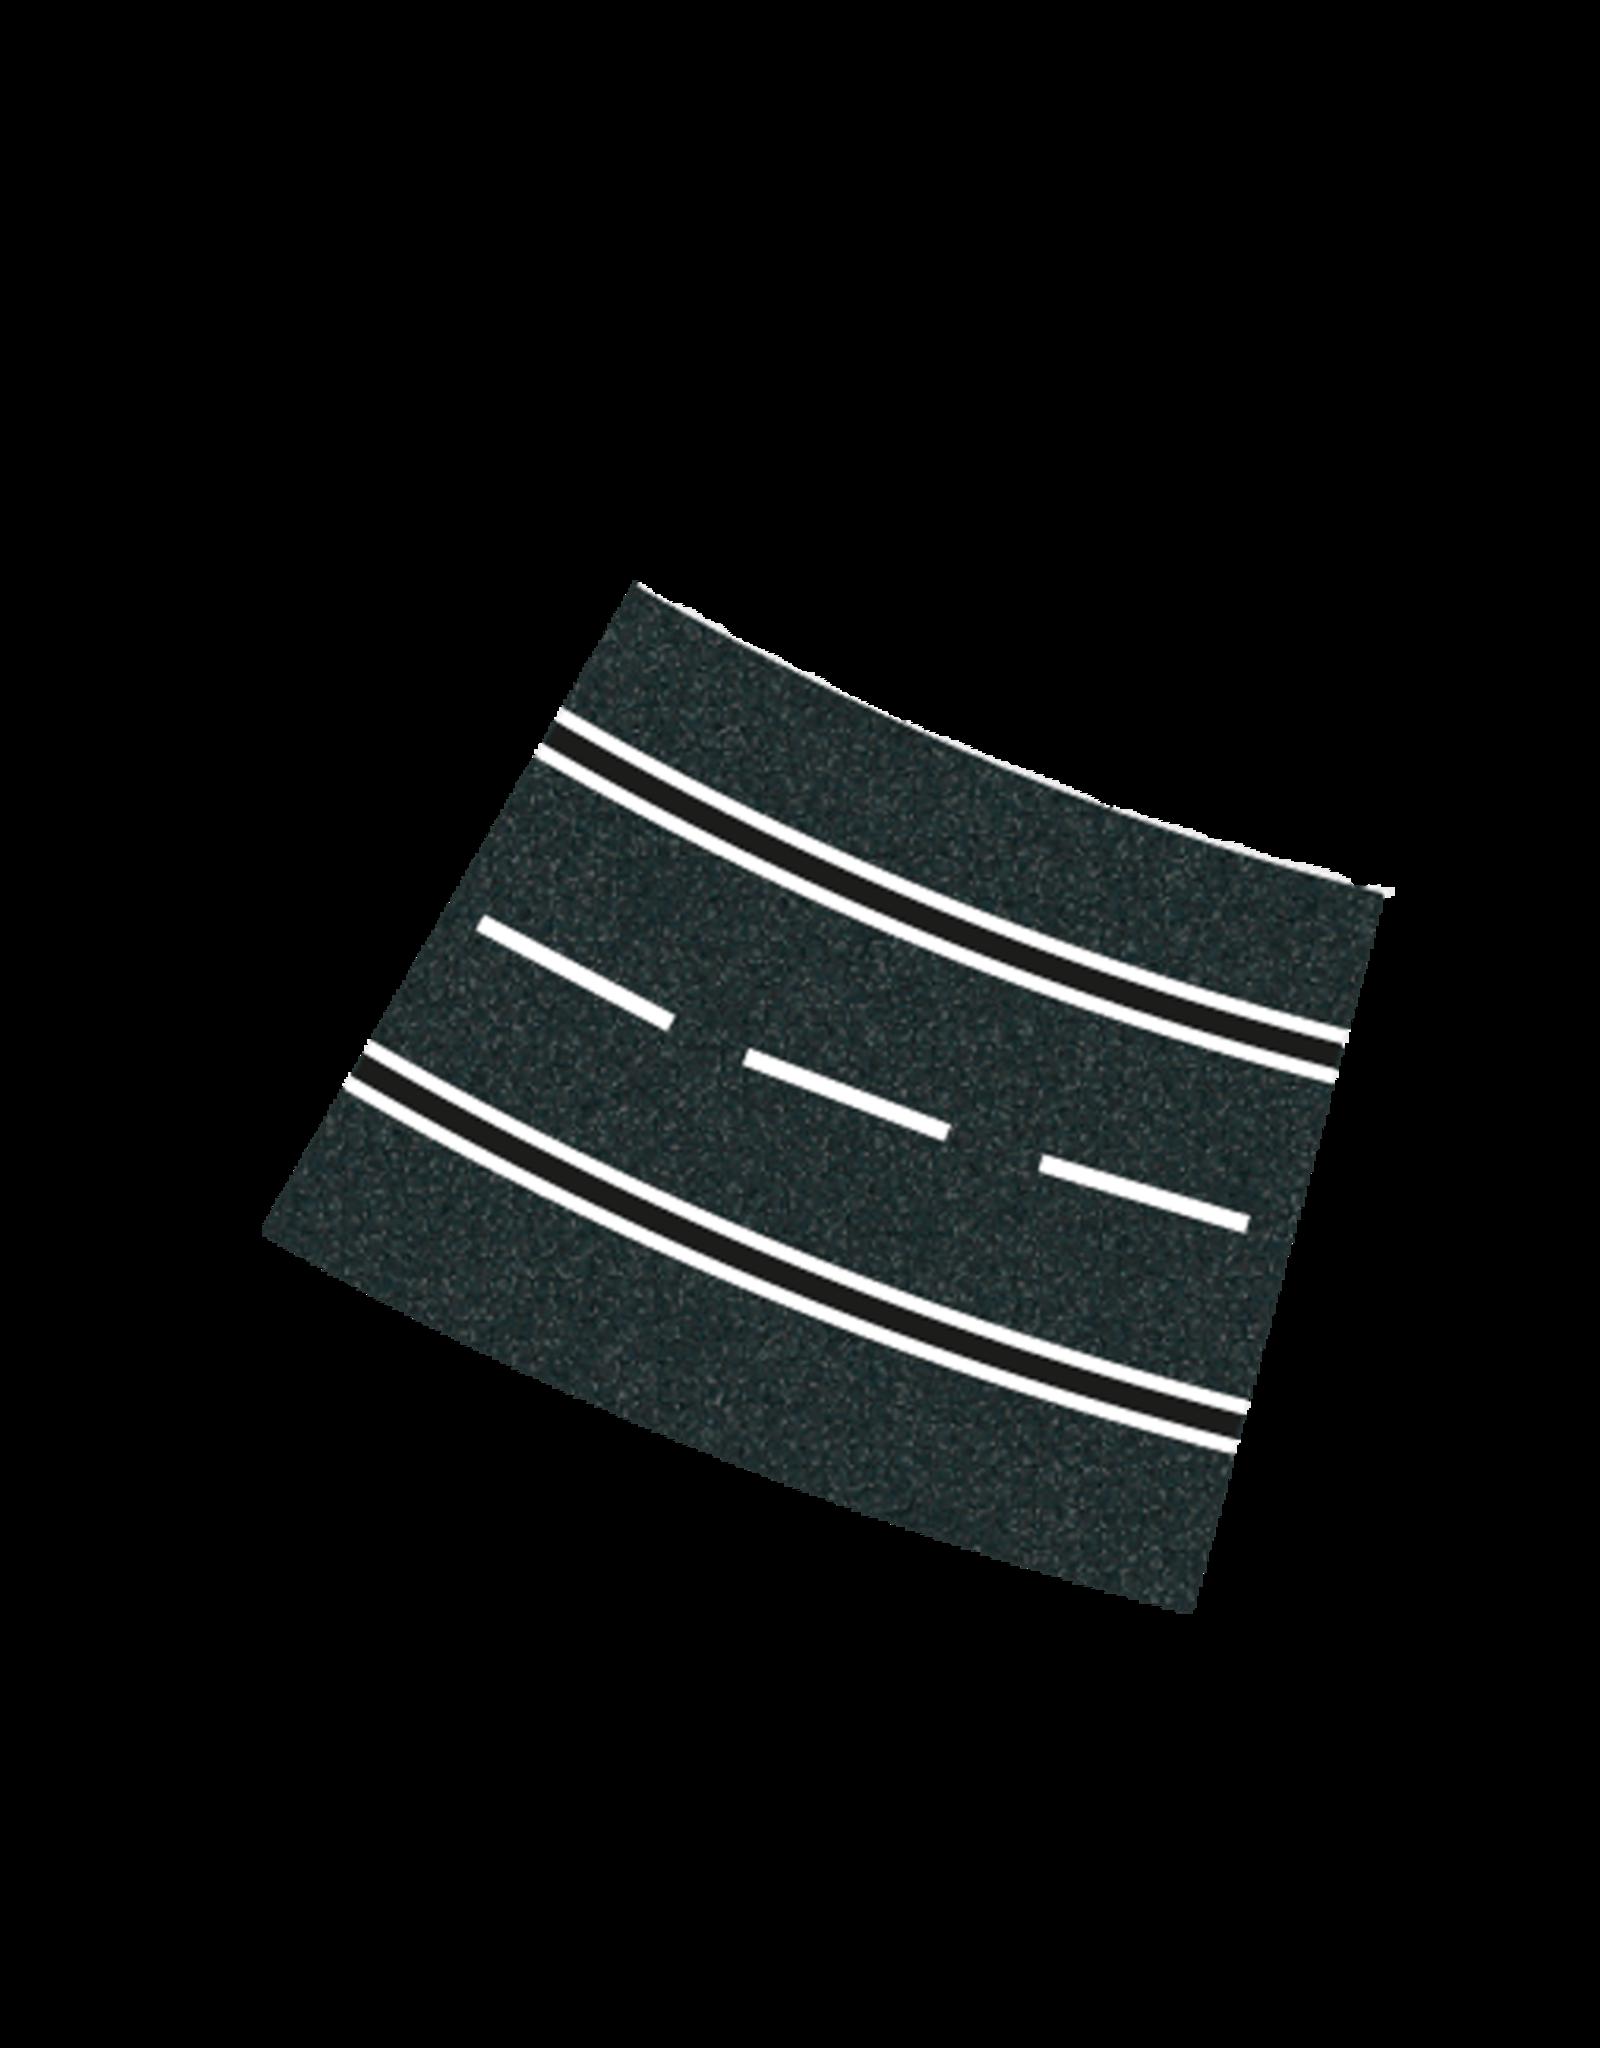 carrera CAR20578 Curve 4/15°, 12 Pieces - Digital 124/132 & Analog